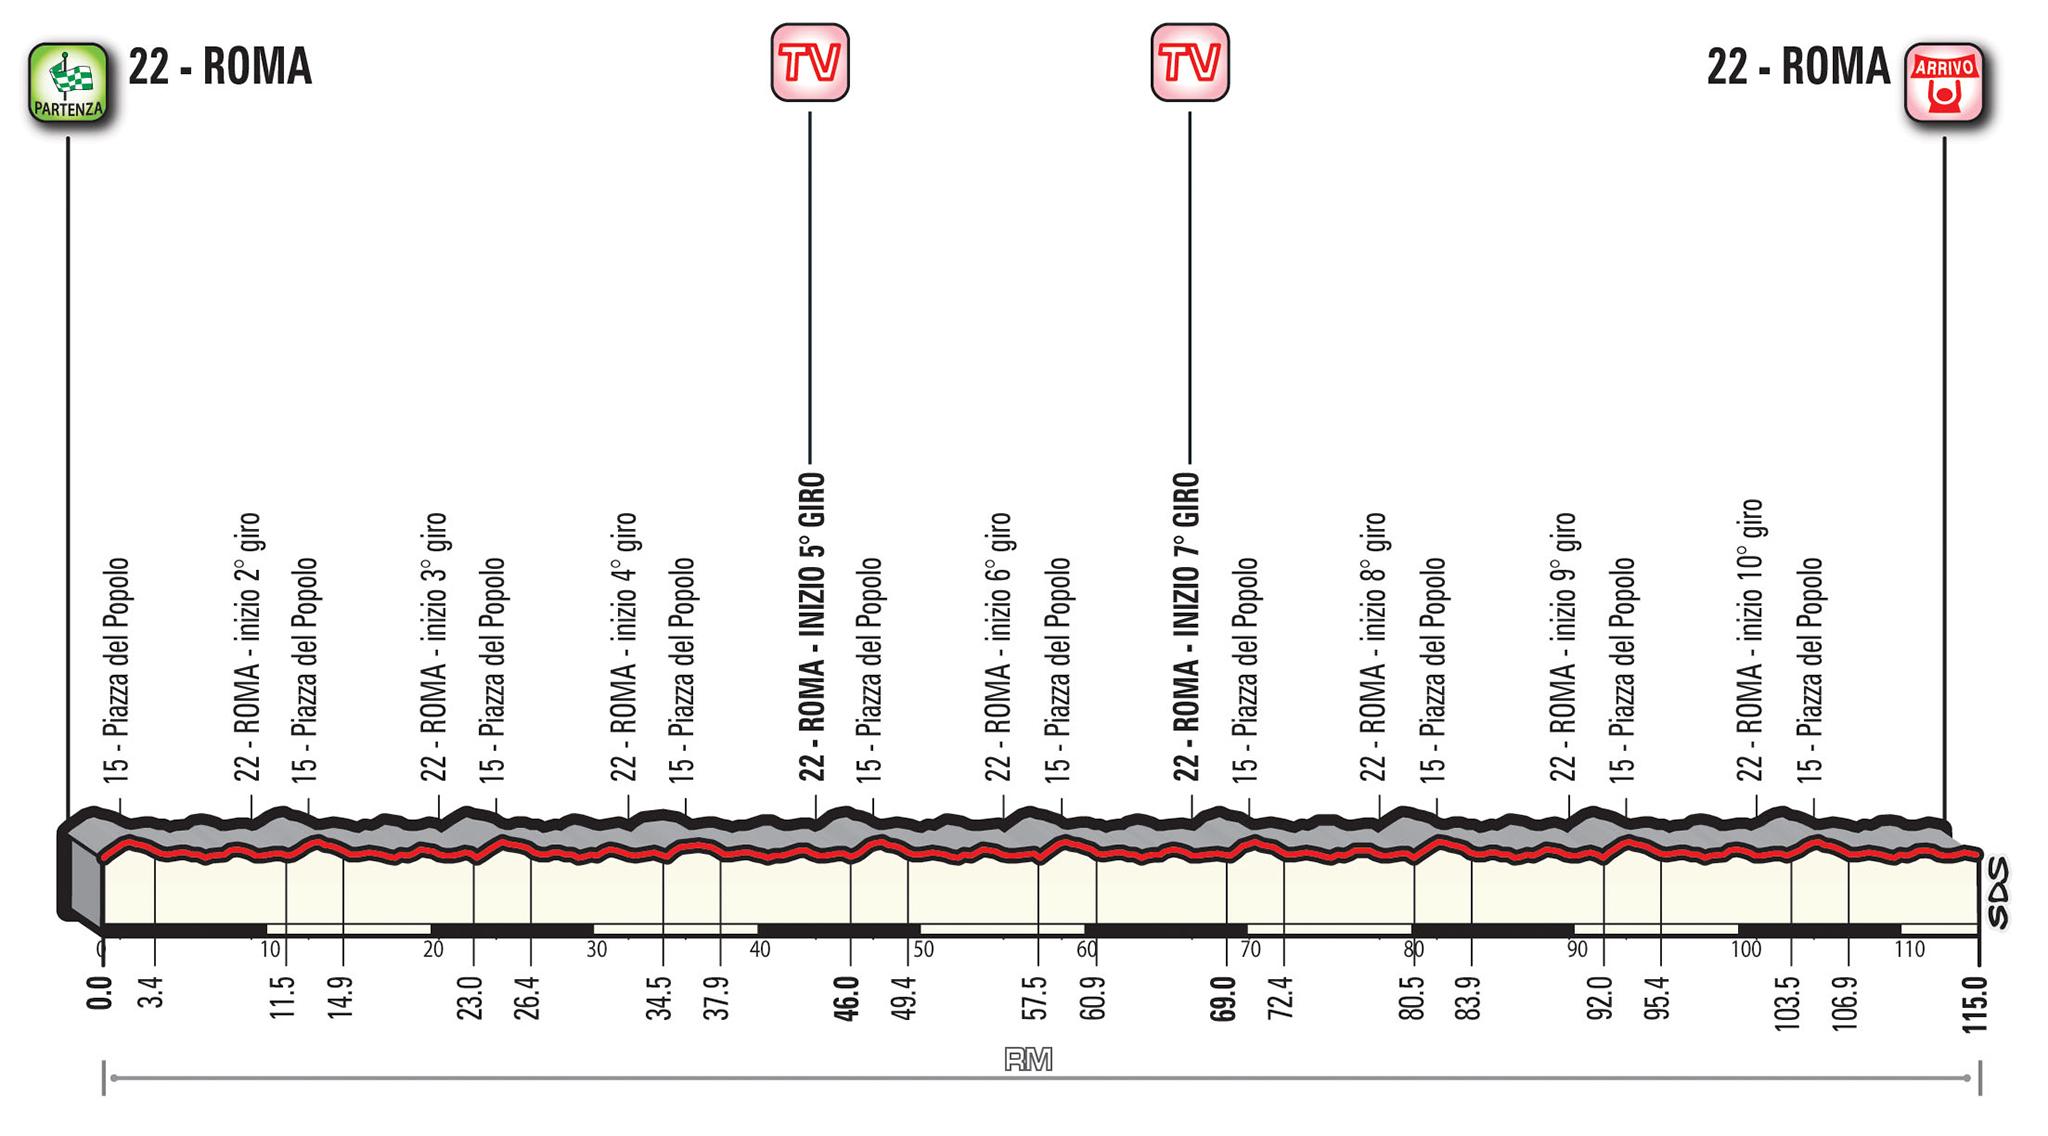 Profiel 21e etappe Giro d'Italia 2018